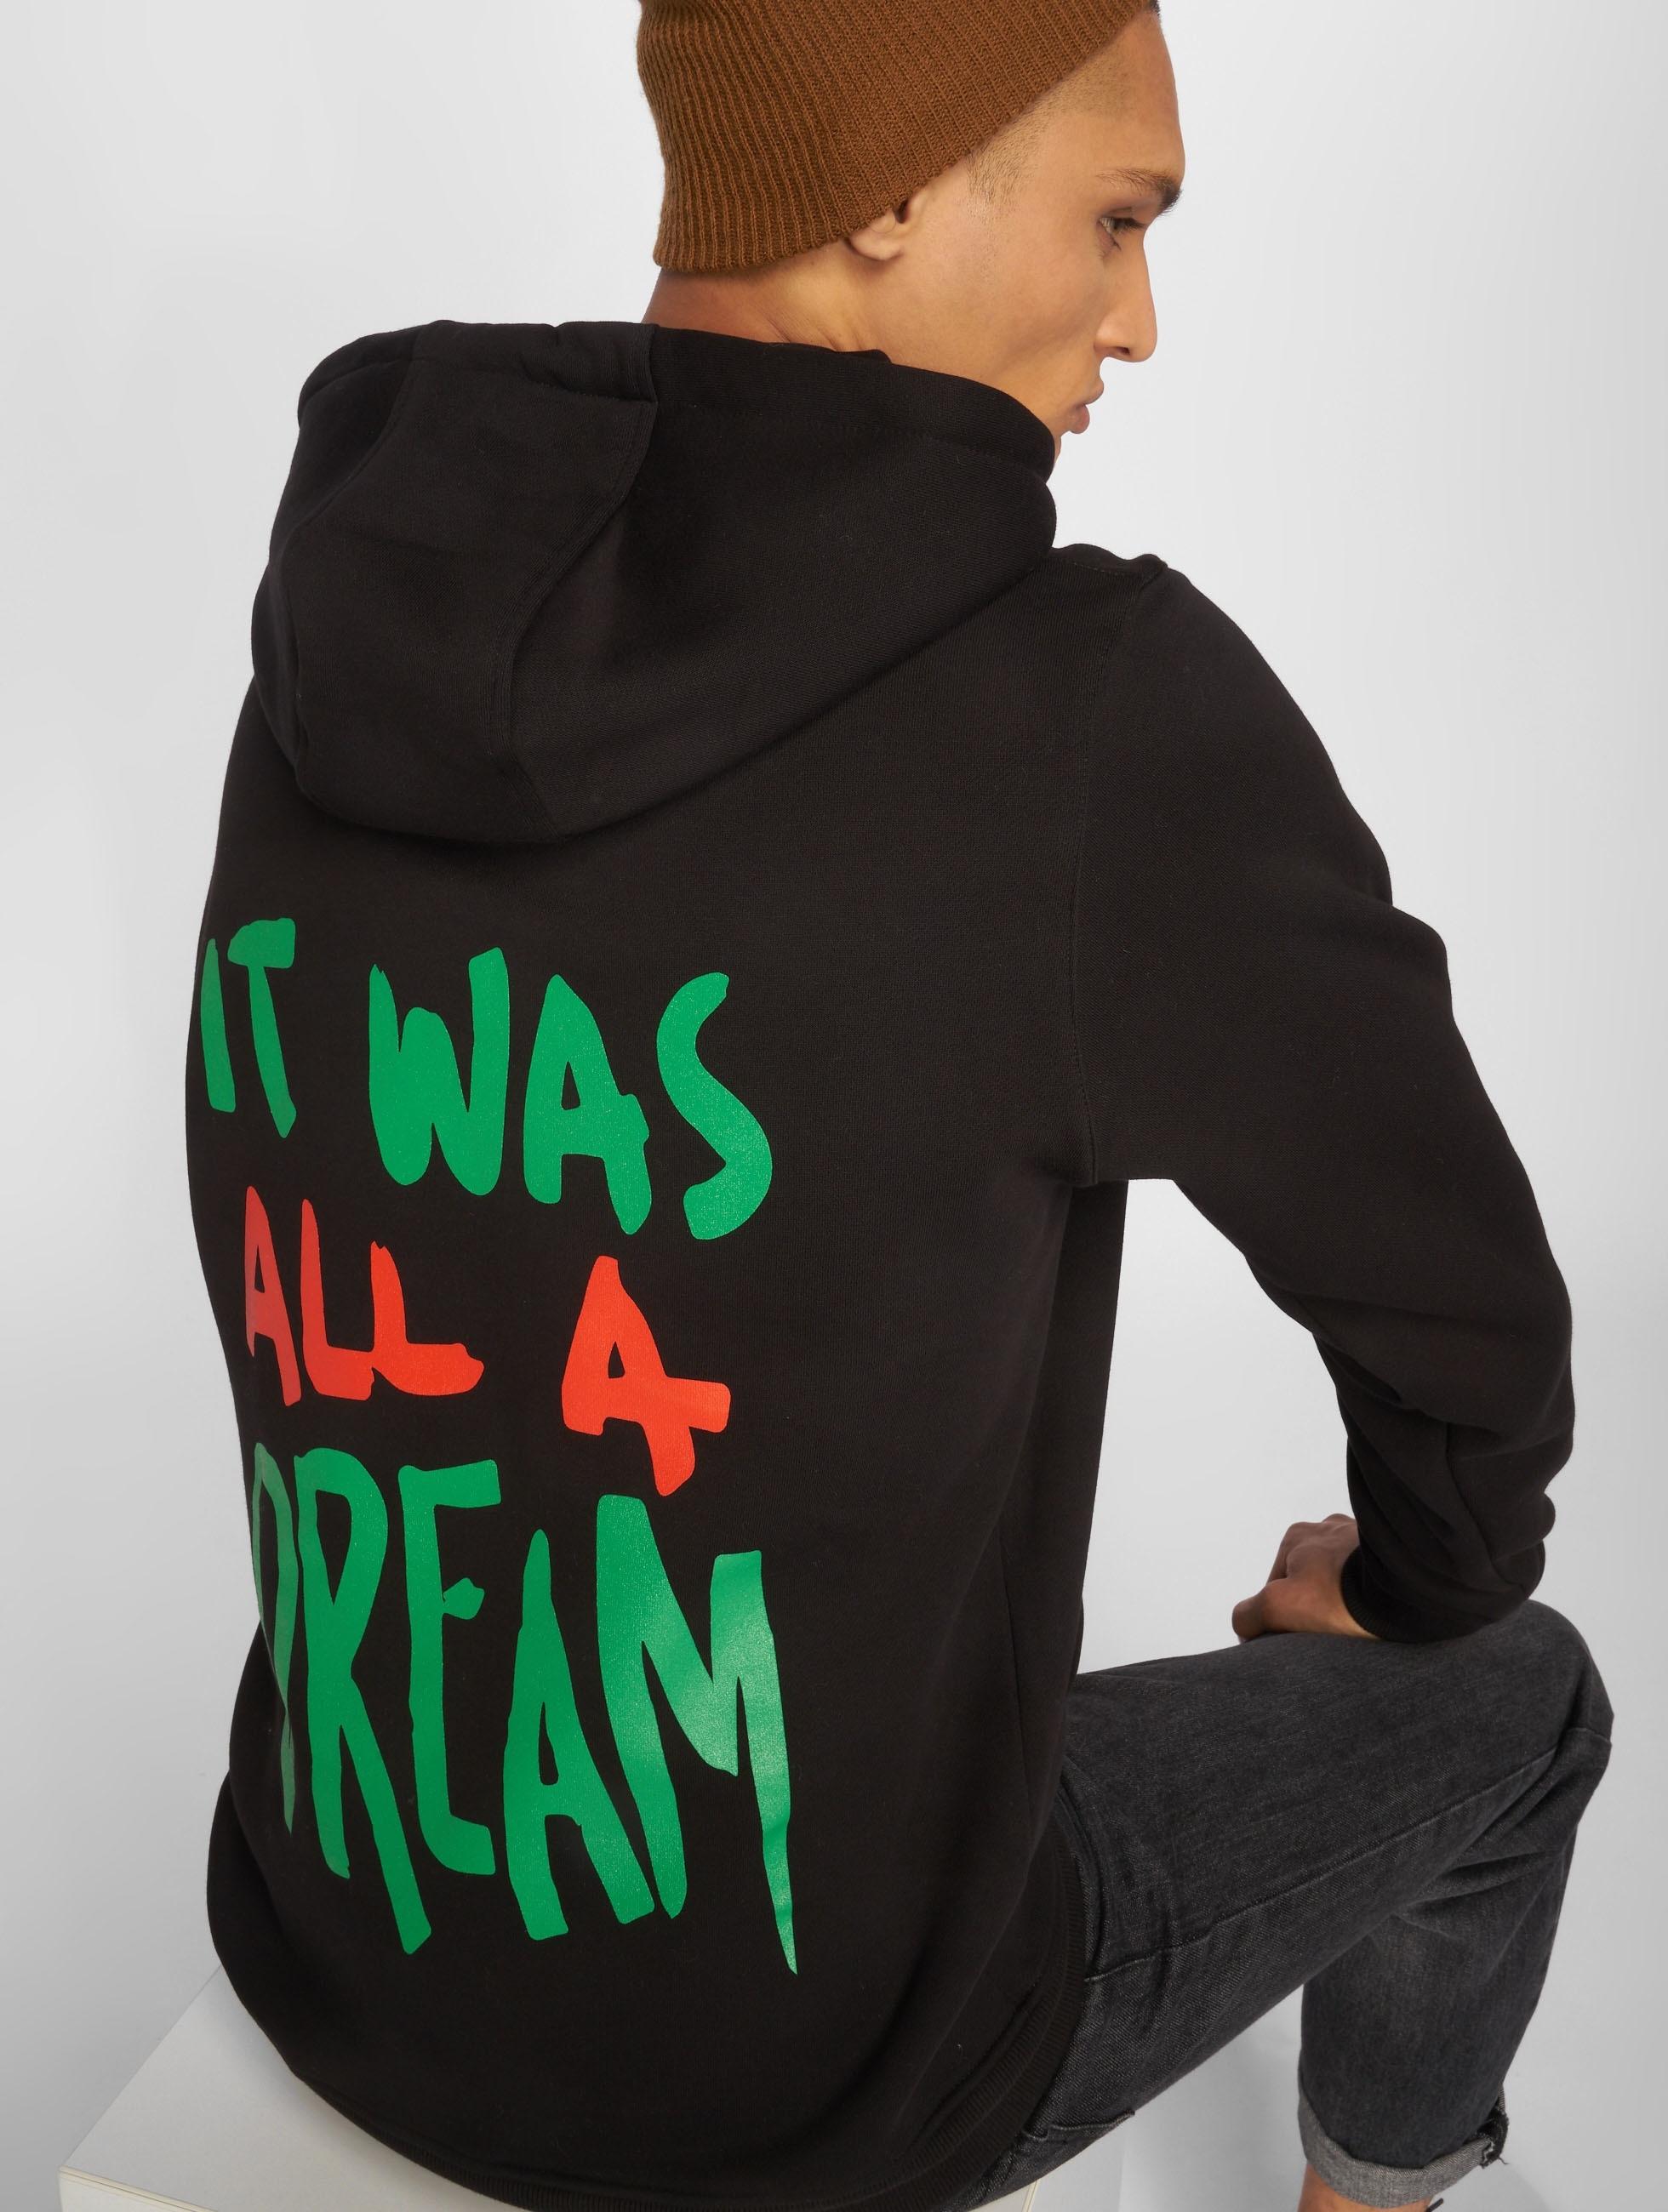 Mister Tee Hoodie A Dream svart